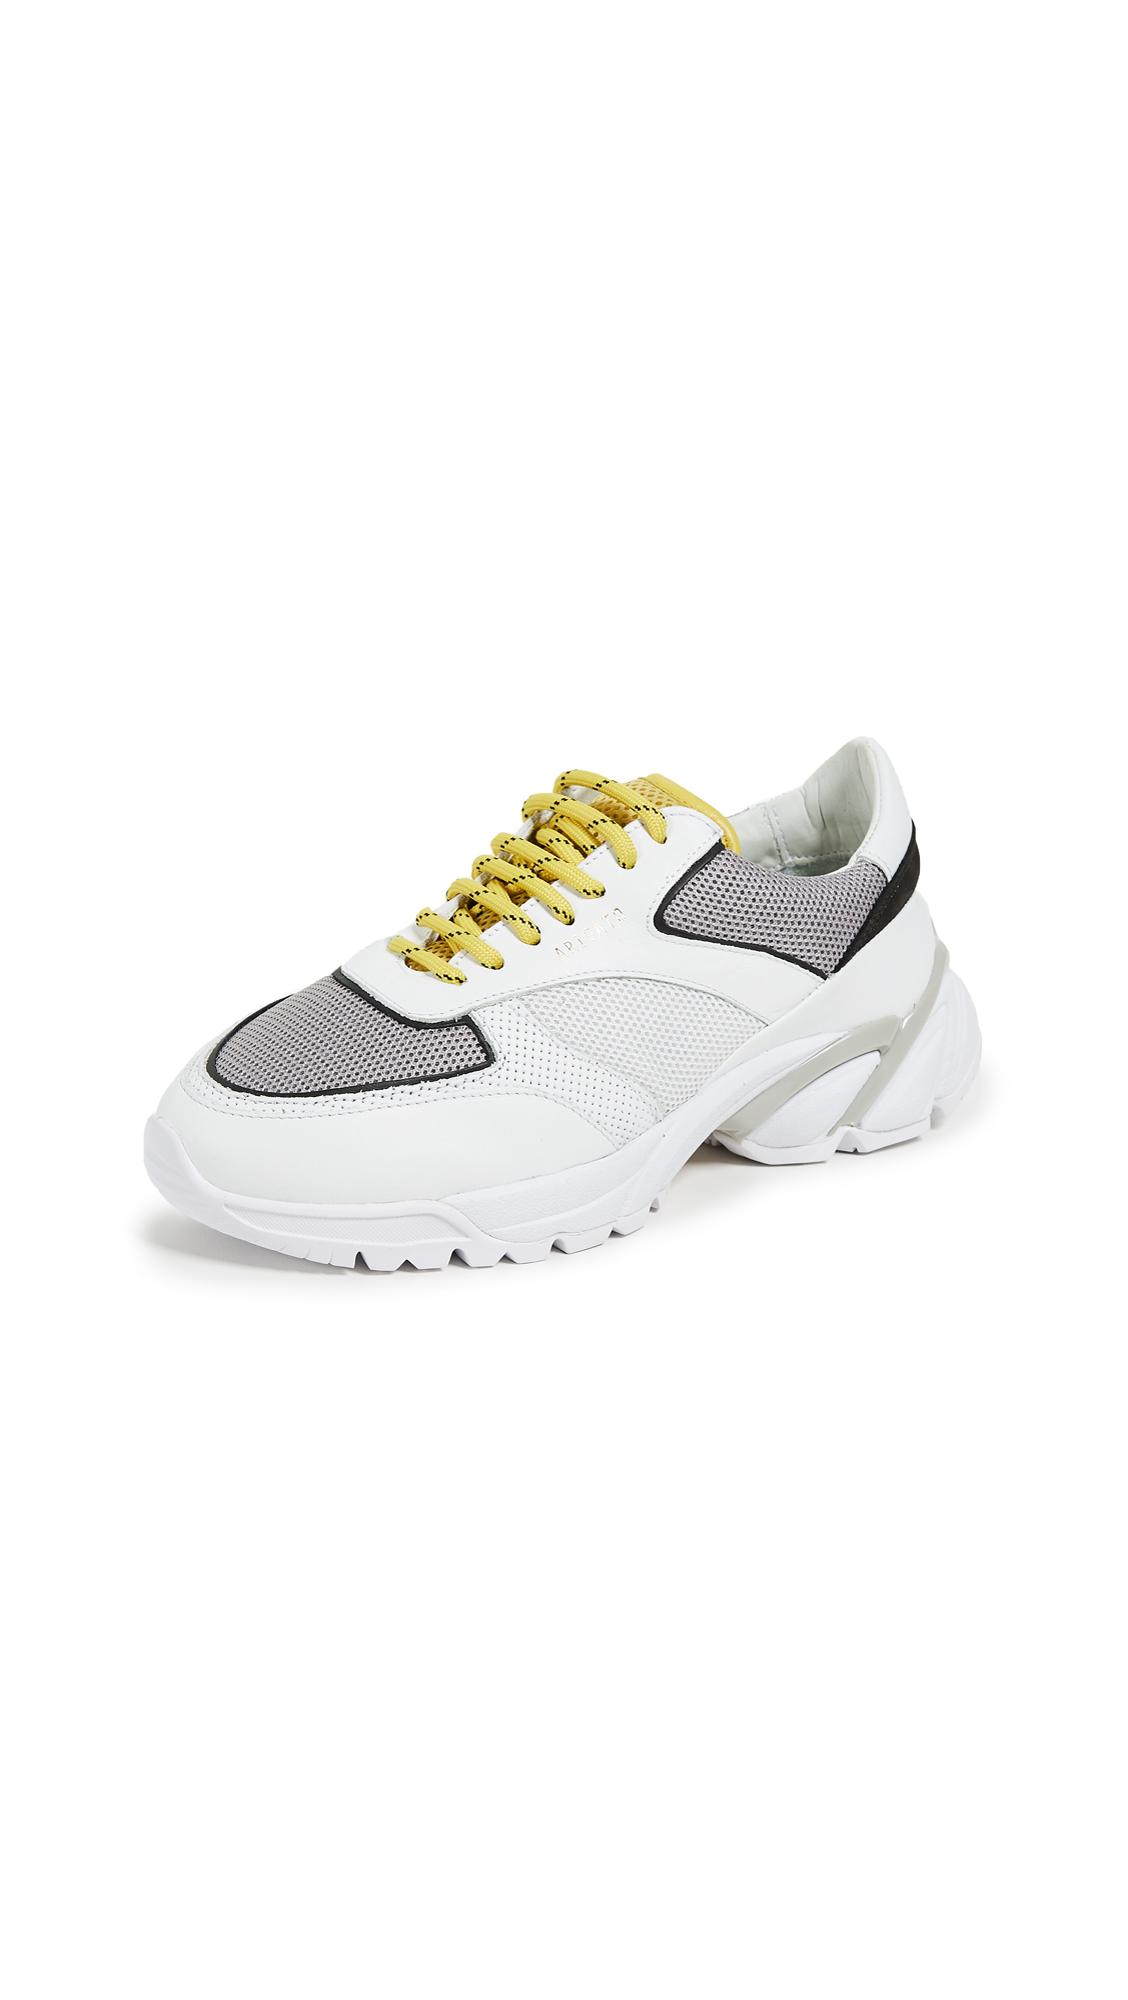 Axel Arigato Tech Runner Sneakers - White/Grey/Yellow